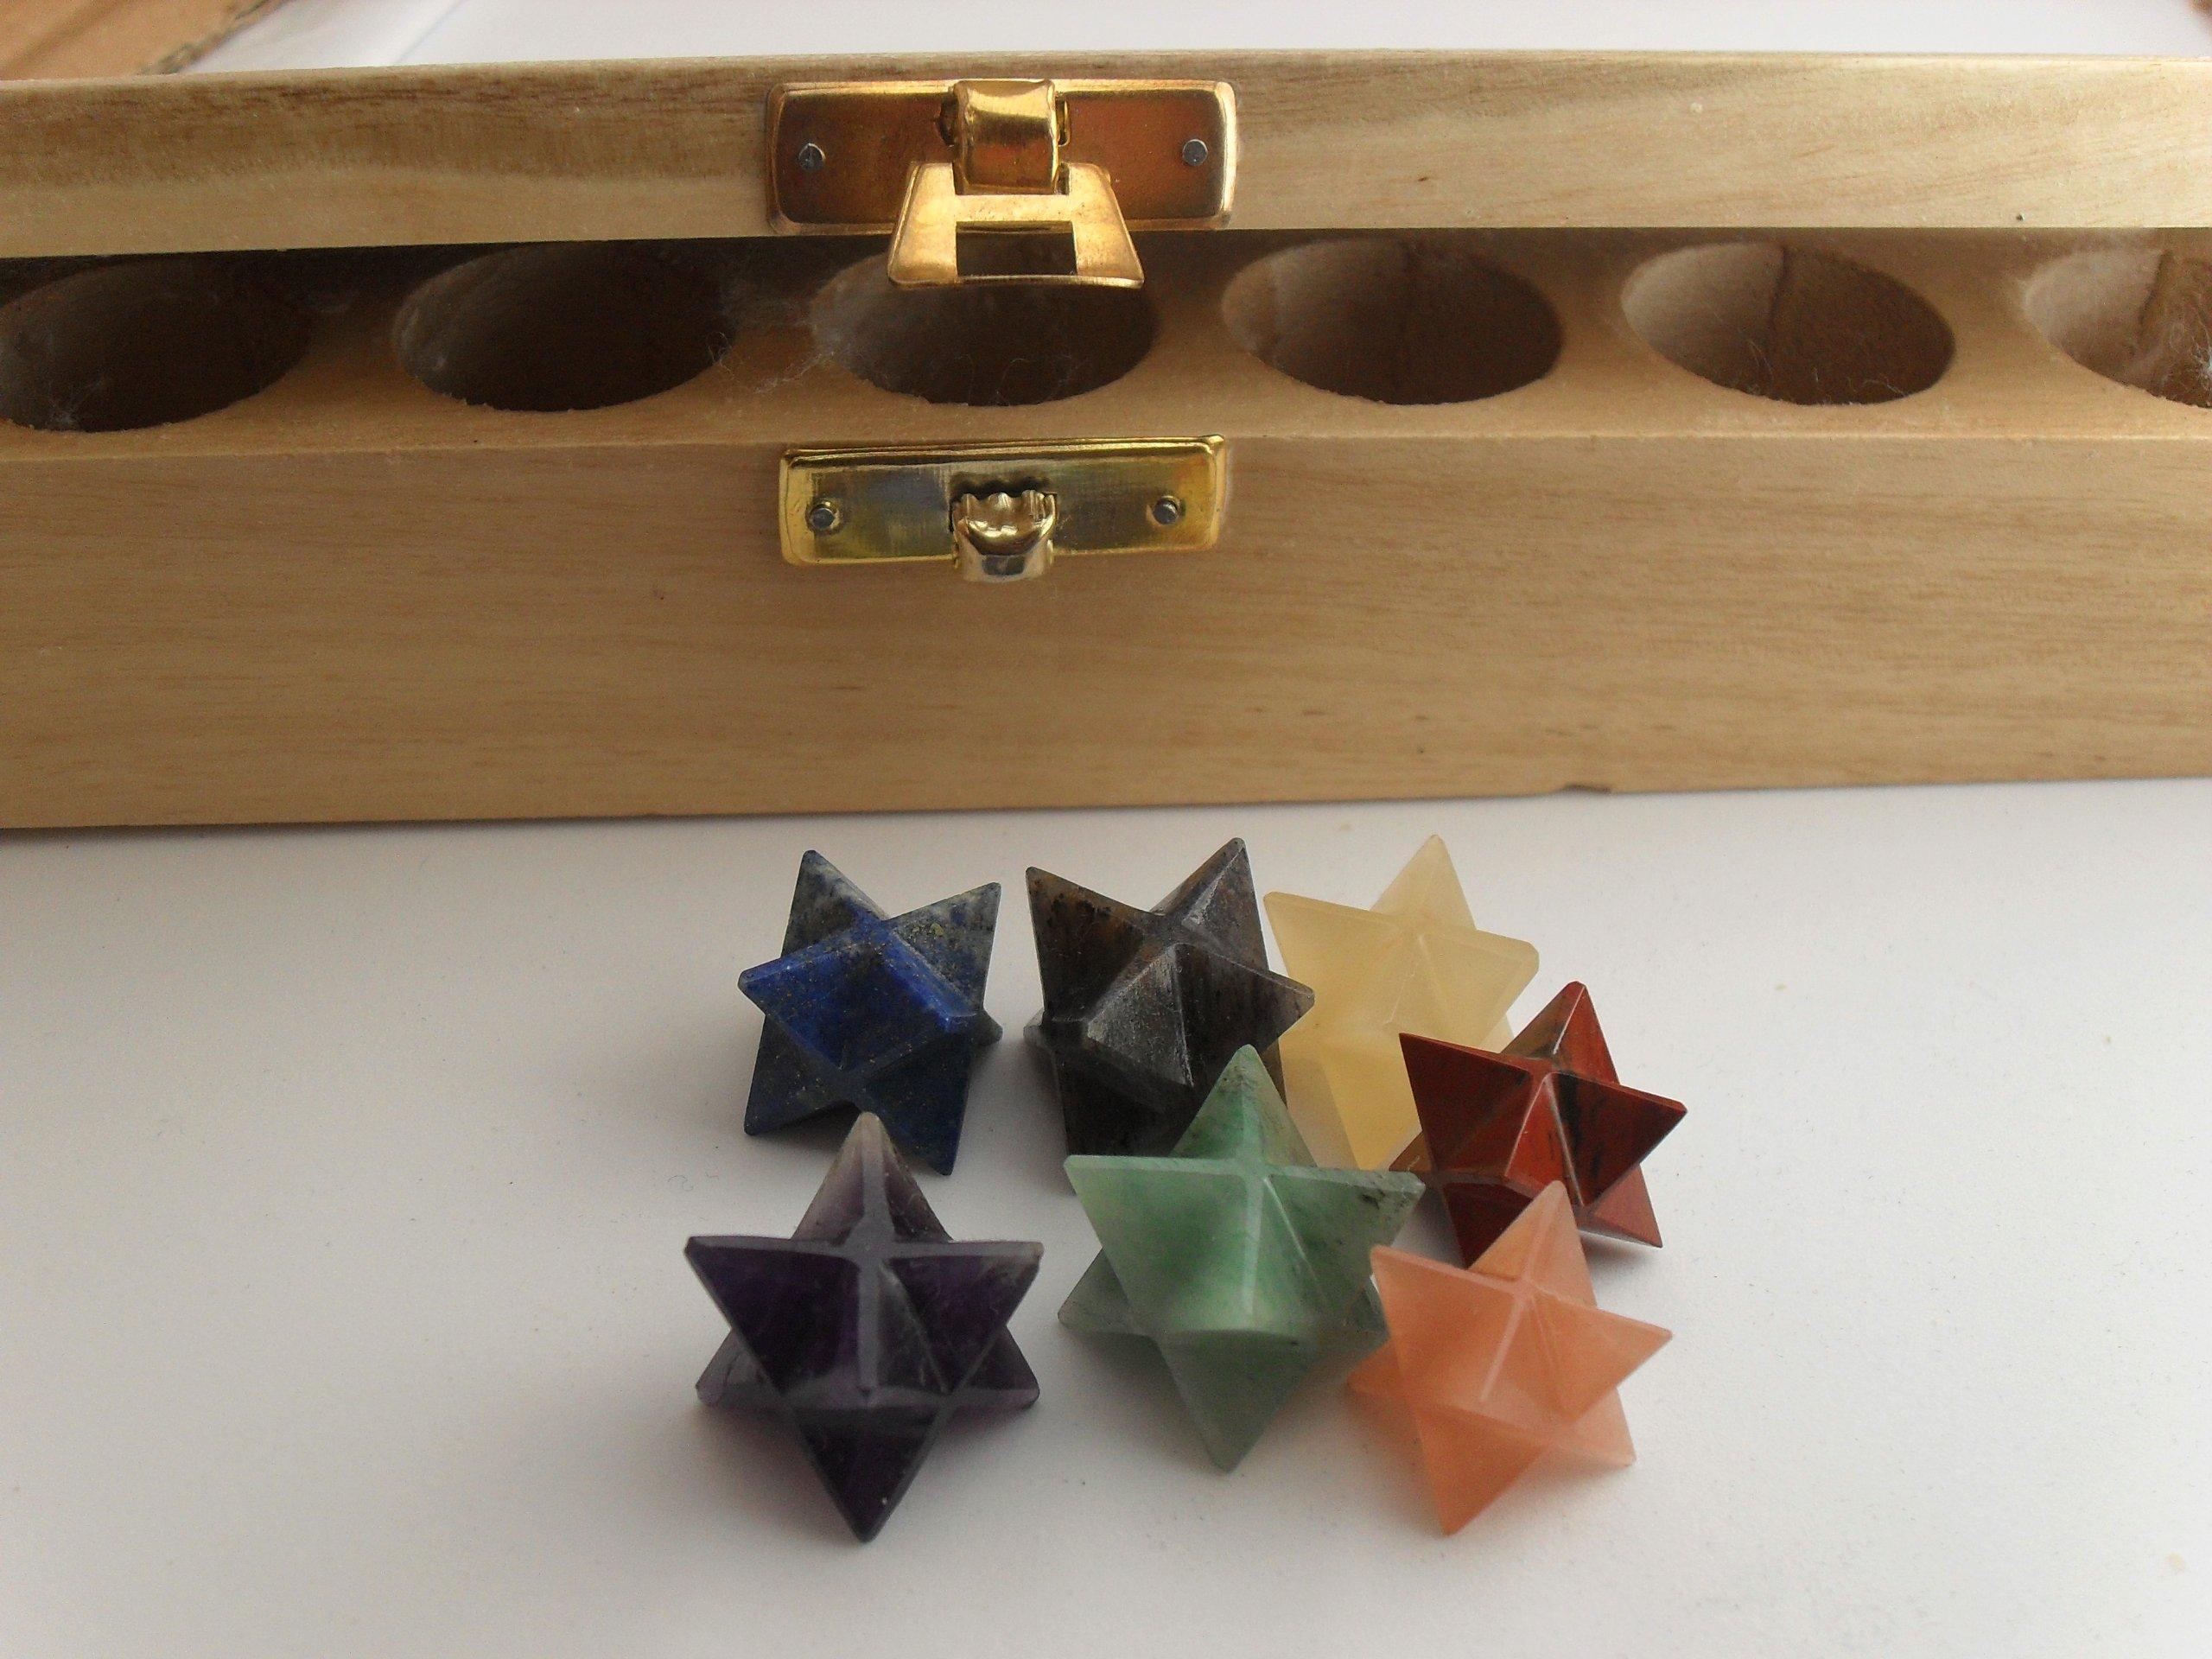 Gemstone Merkaba Star Sacred Geometry Set w/ Wooden Box- Chakra Balancing